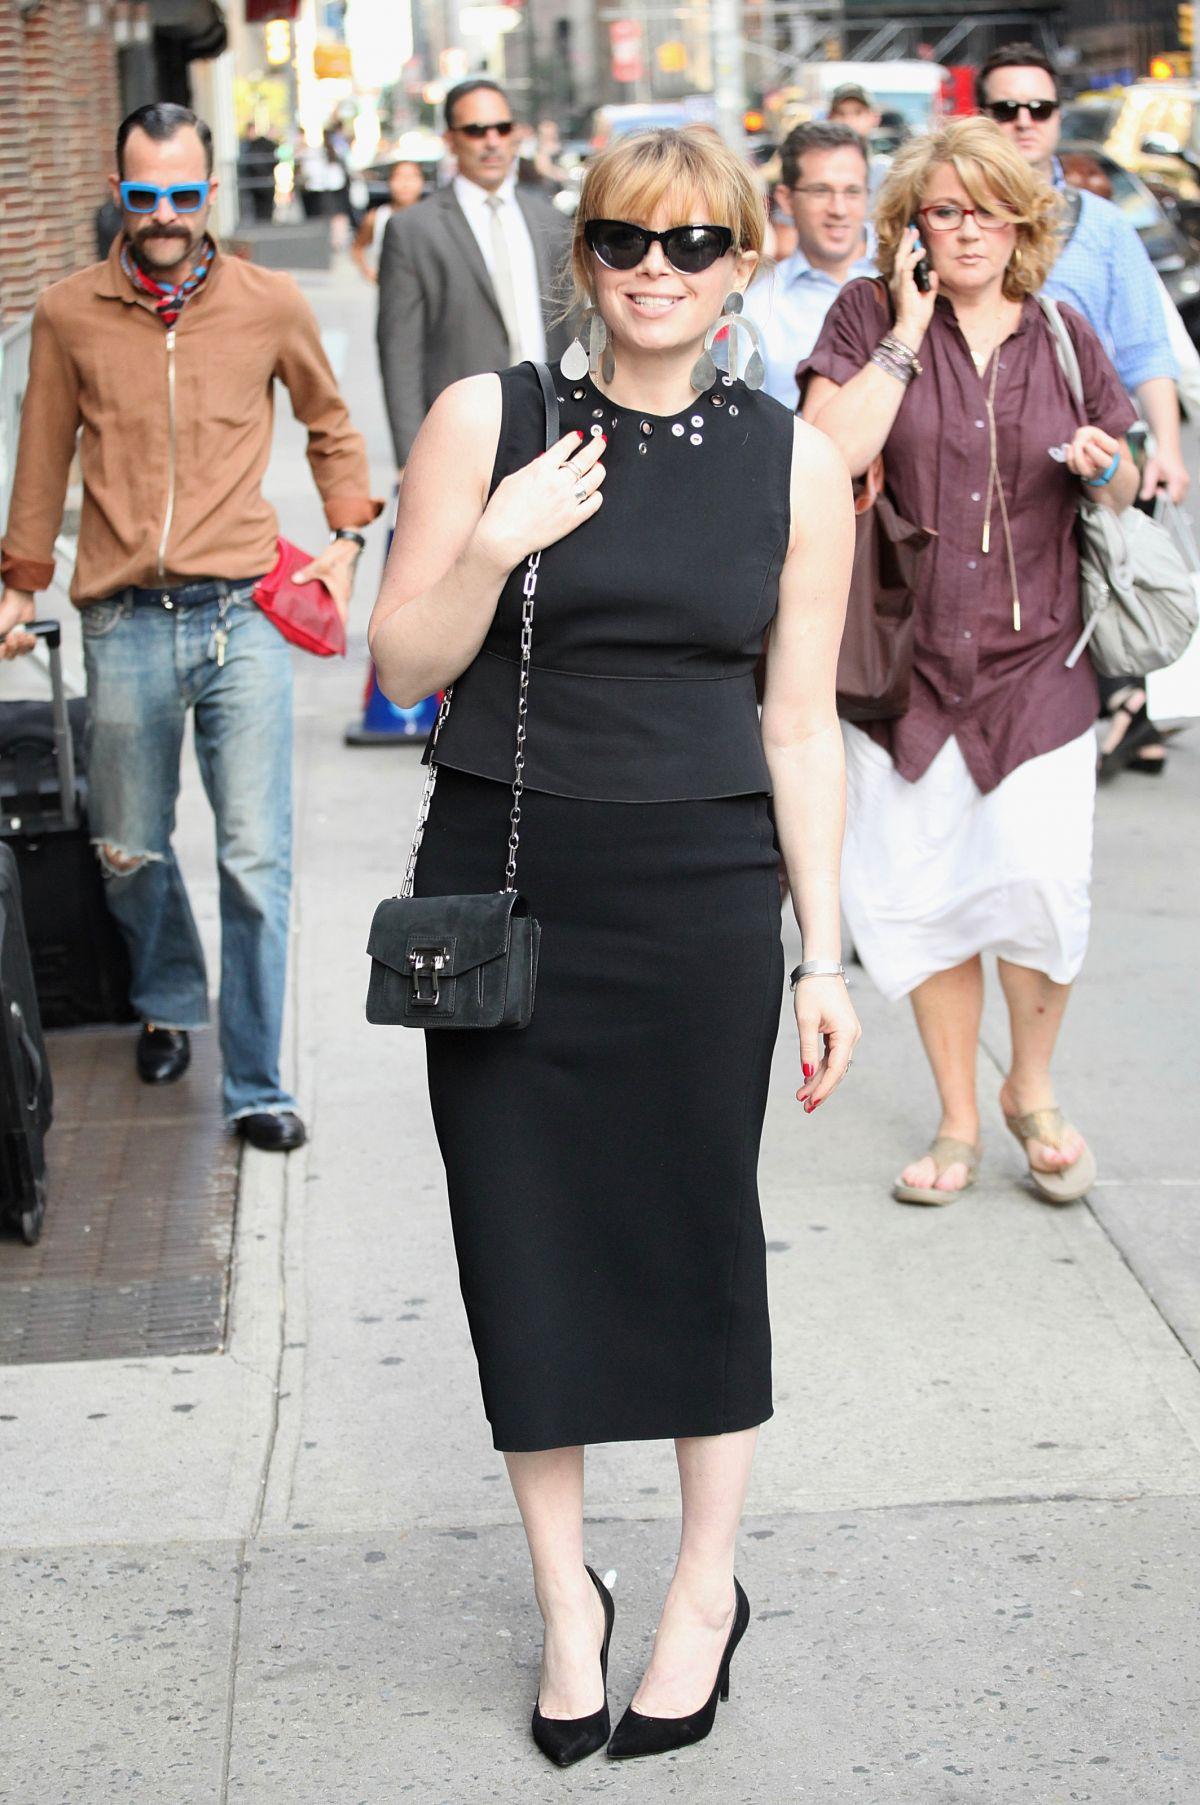 NATASHA LYONNE Out in New York 06/30/2016